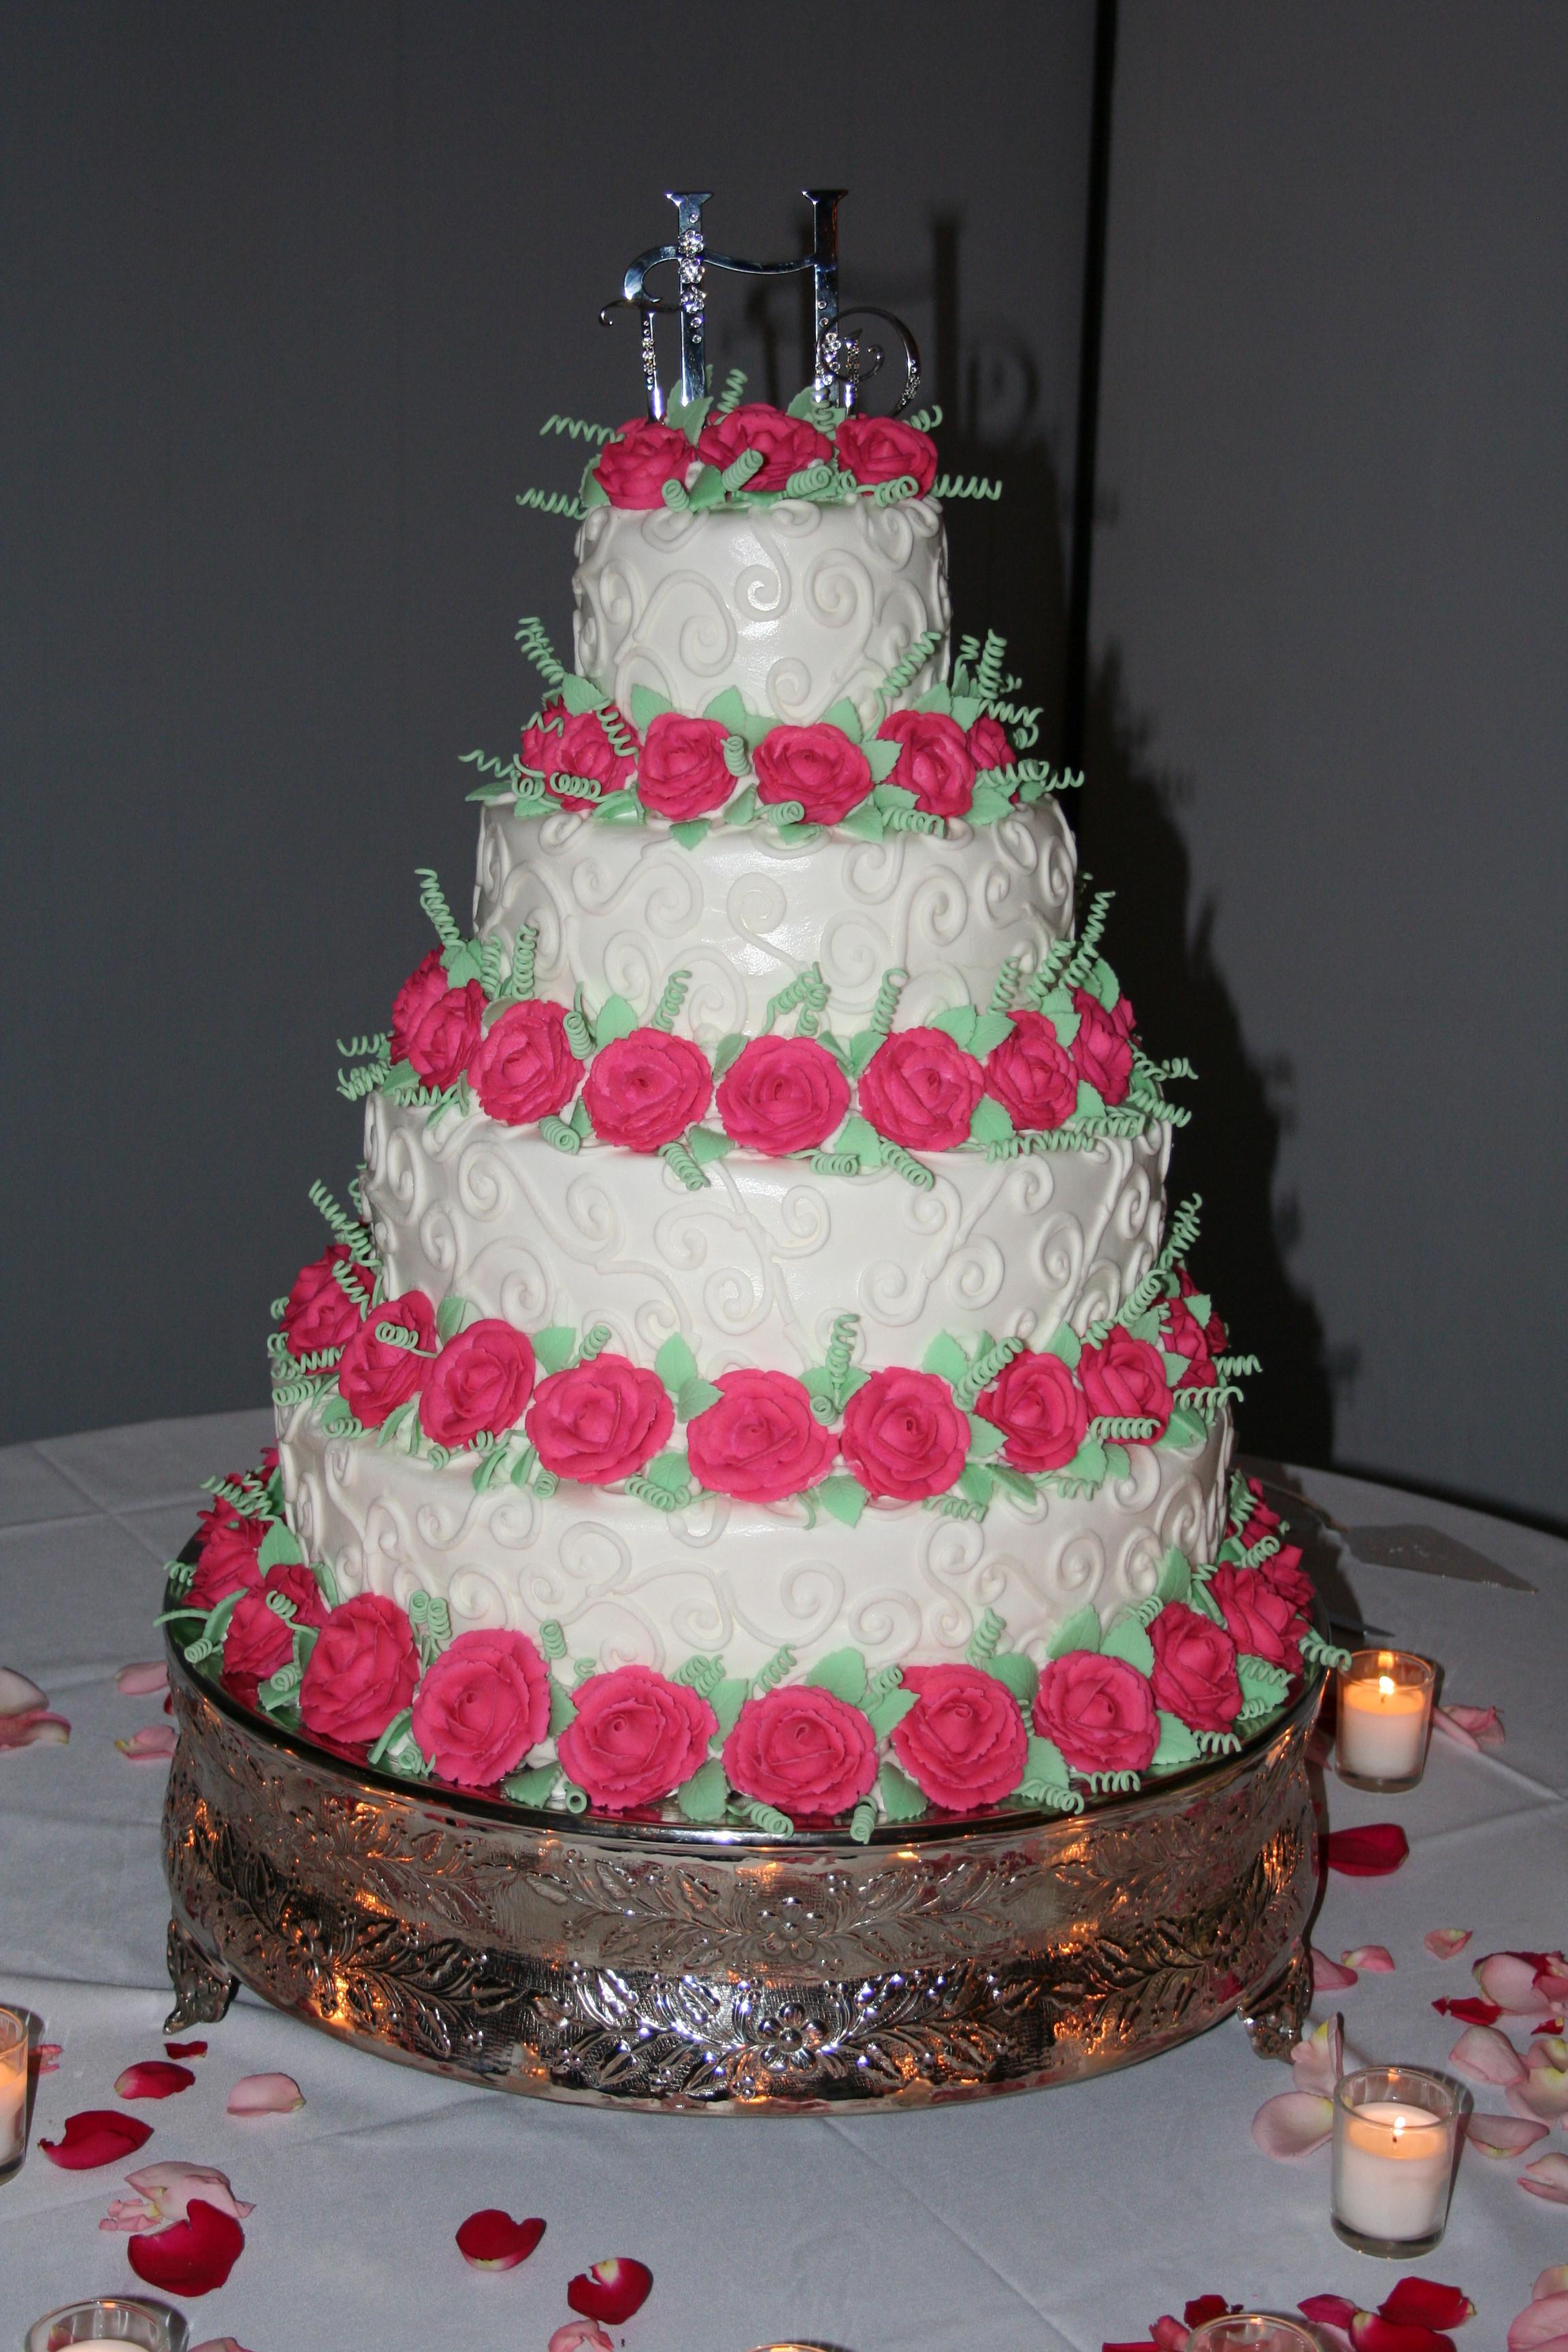 Pictures Of Walmart Wedding Cakes  Walmart Wedding Cake Prices